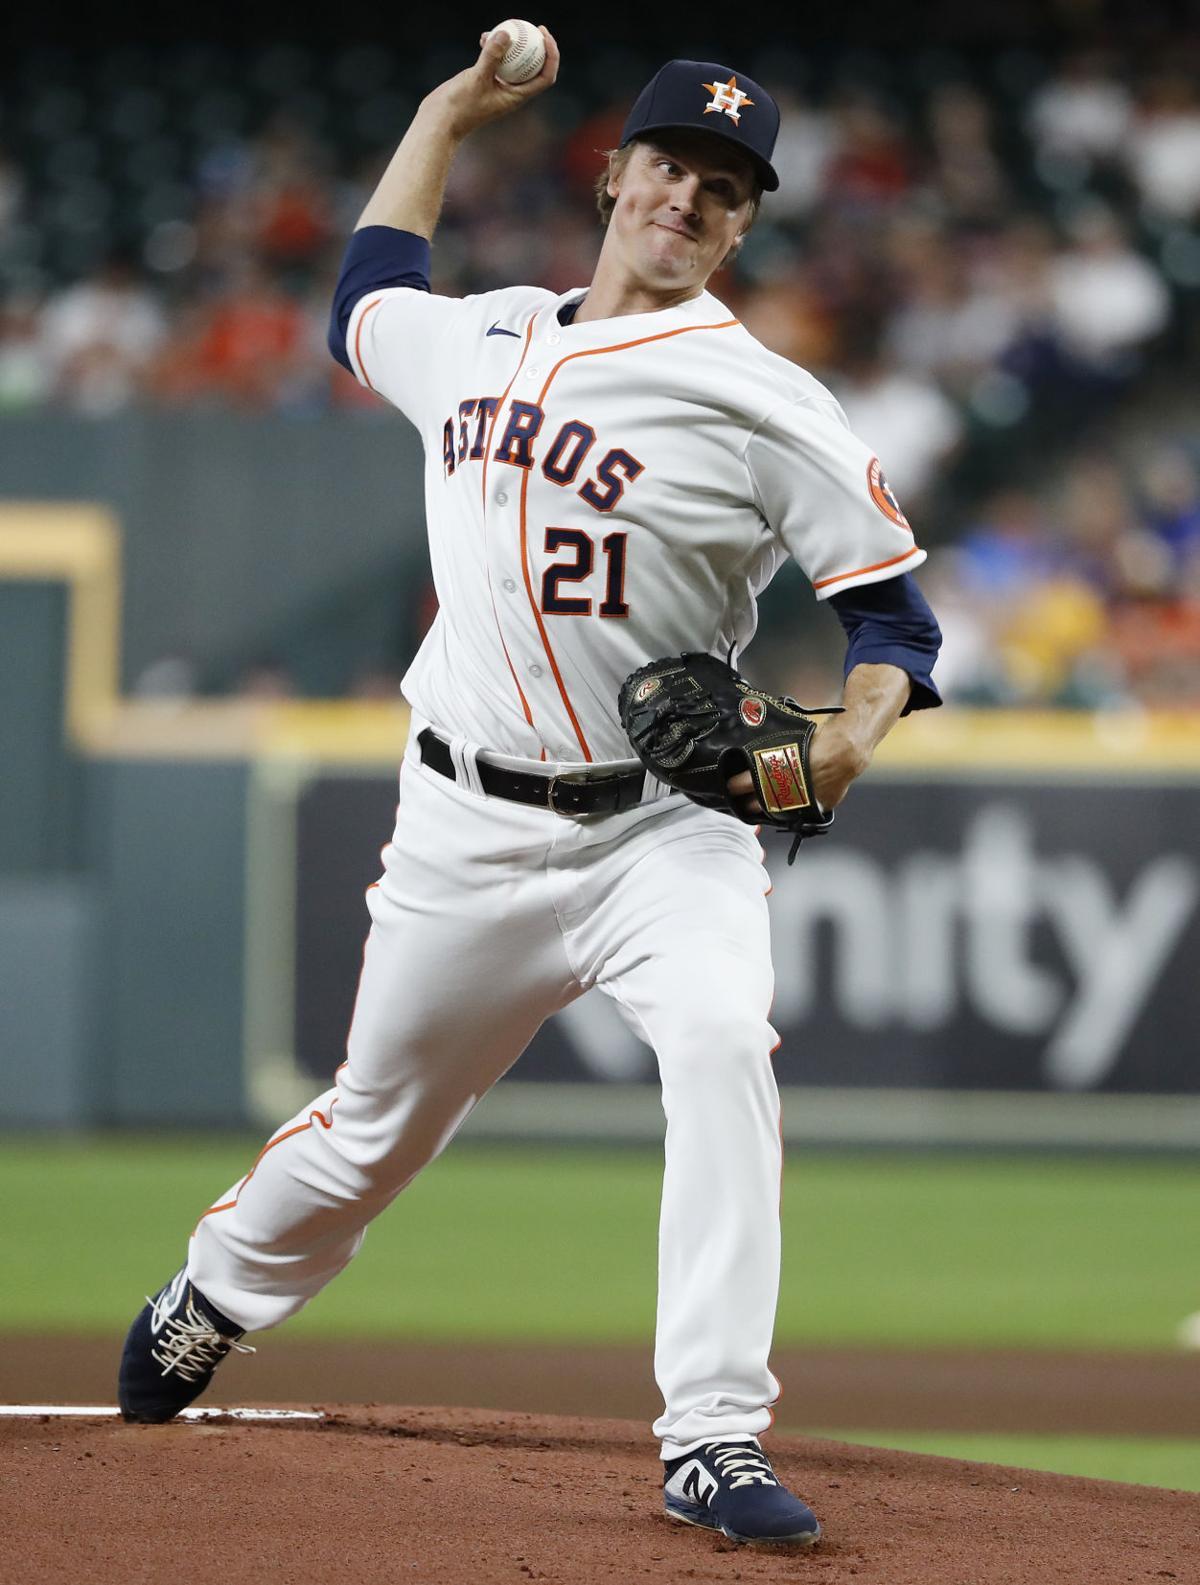 Houston Astros vs. Cleveland Indians